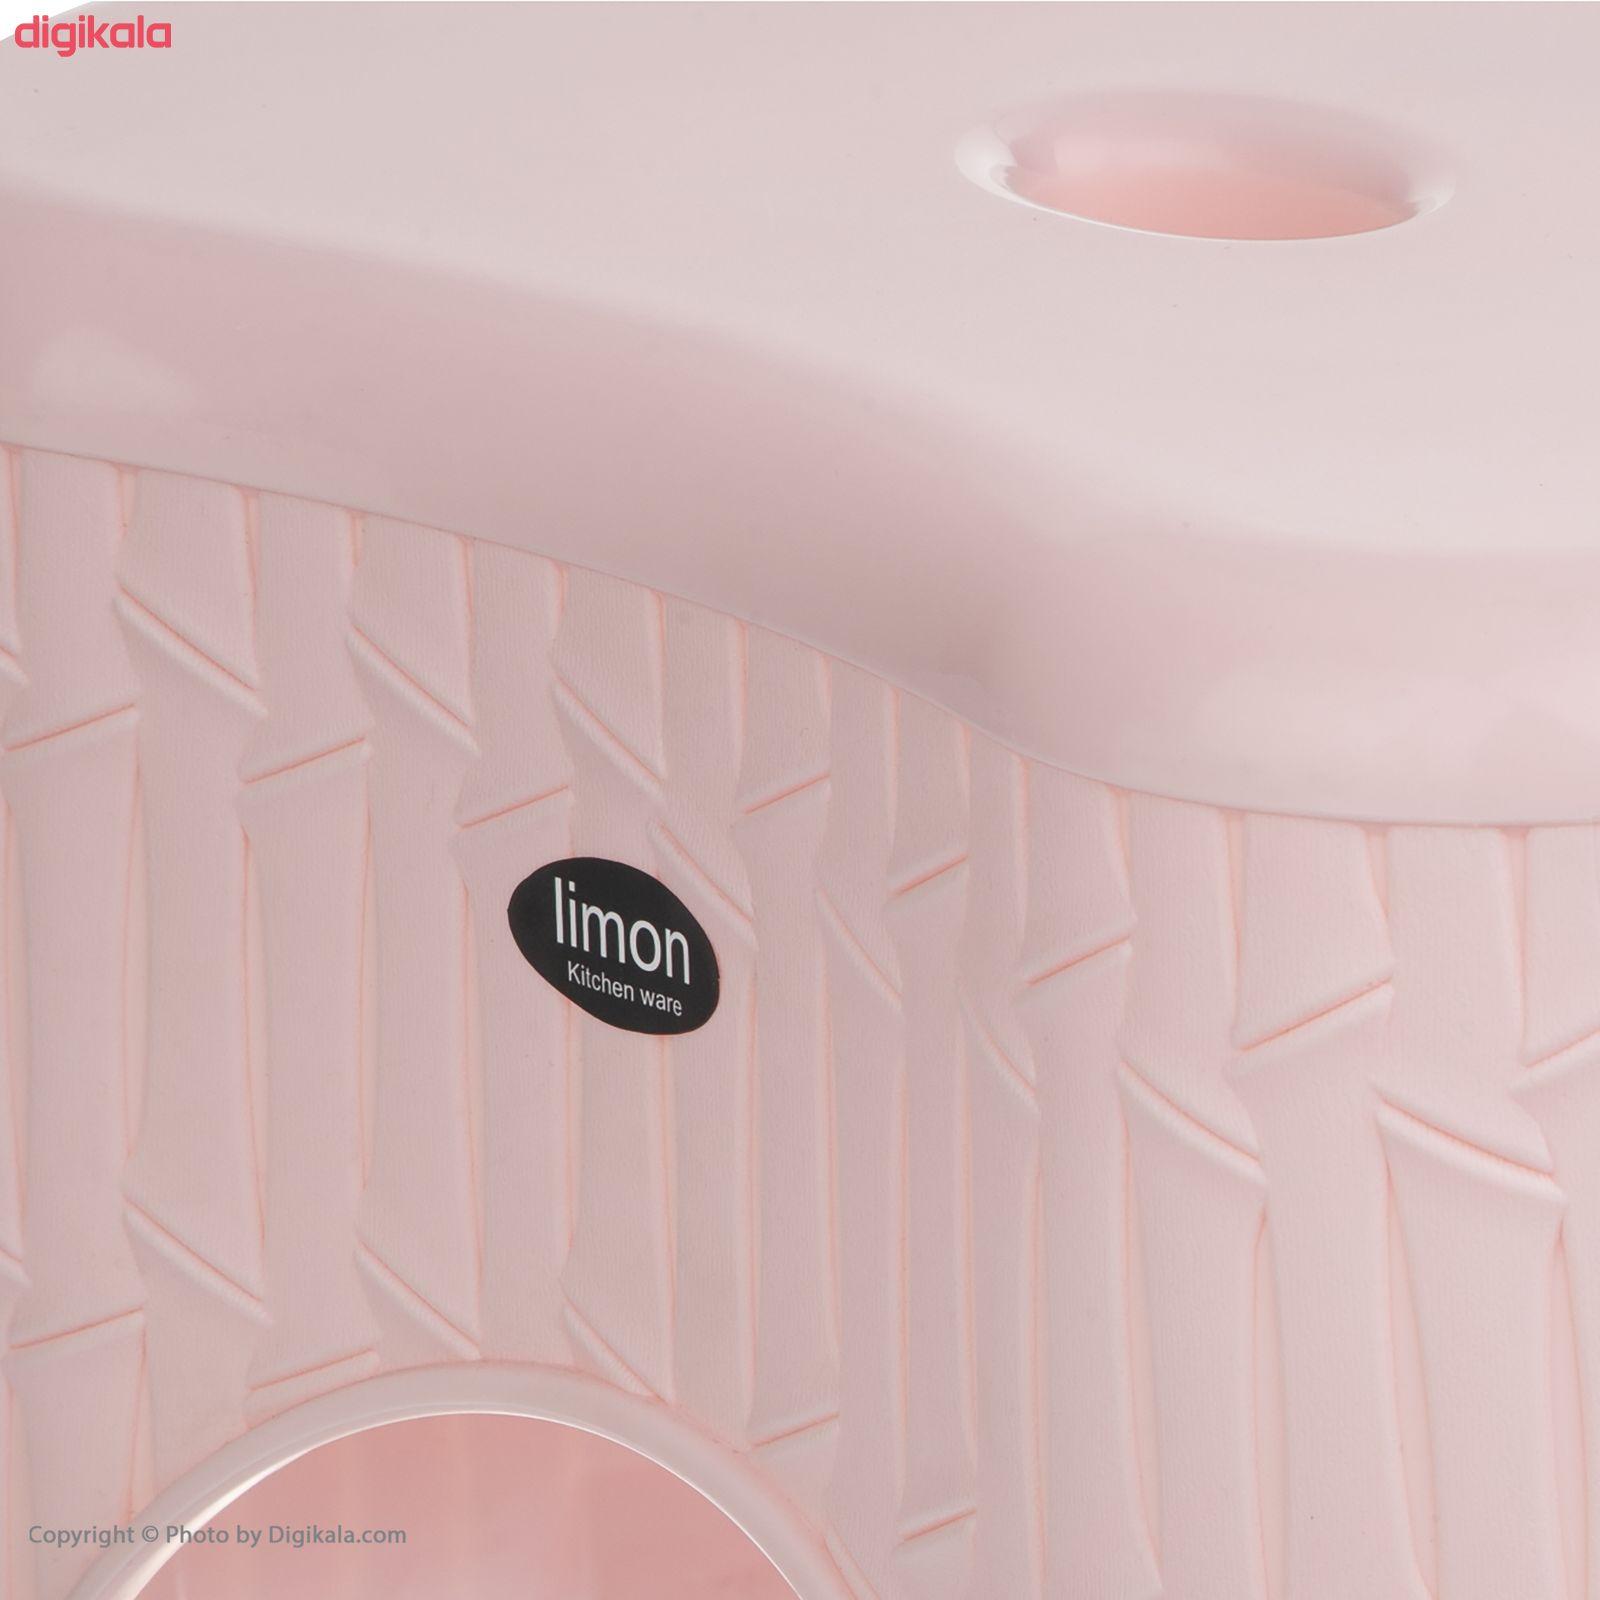 چهارپایه حمام لیمون مدل بامبو کد 01 main 1 2